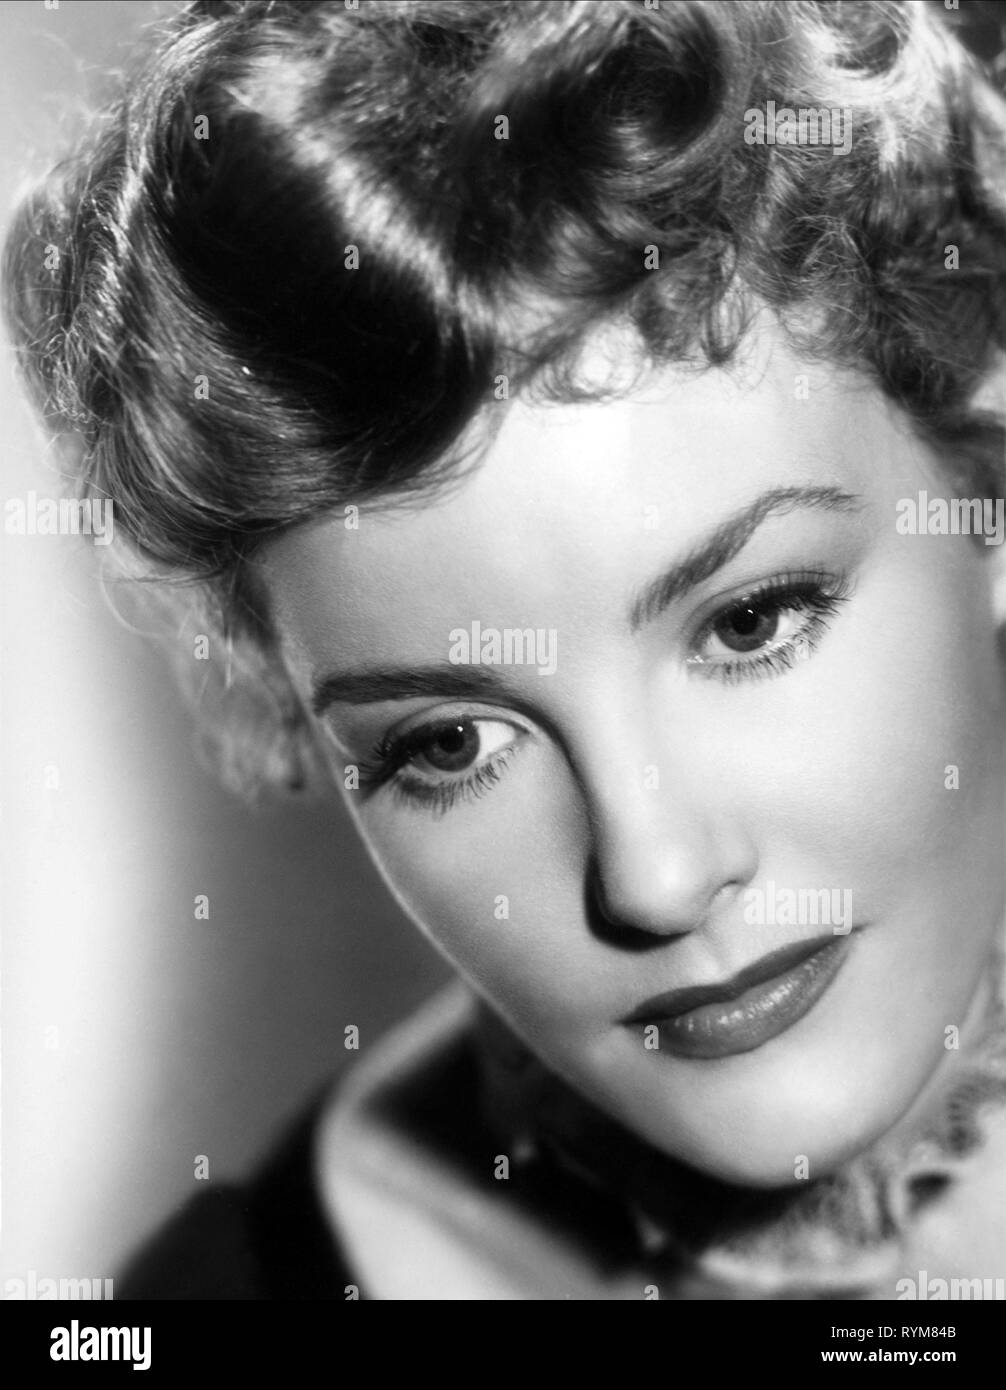 PETULA CLARK, THE CARD, 1952 Stock Photo